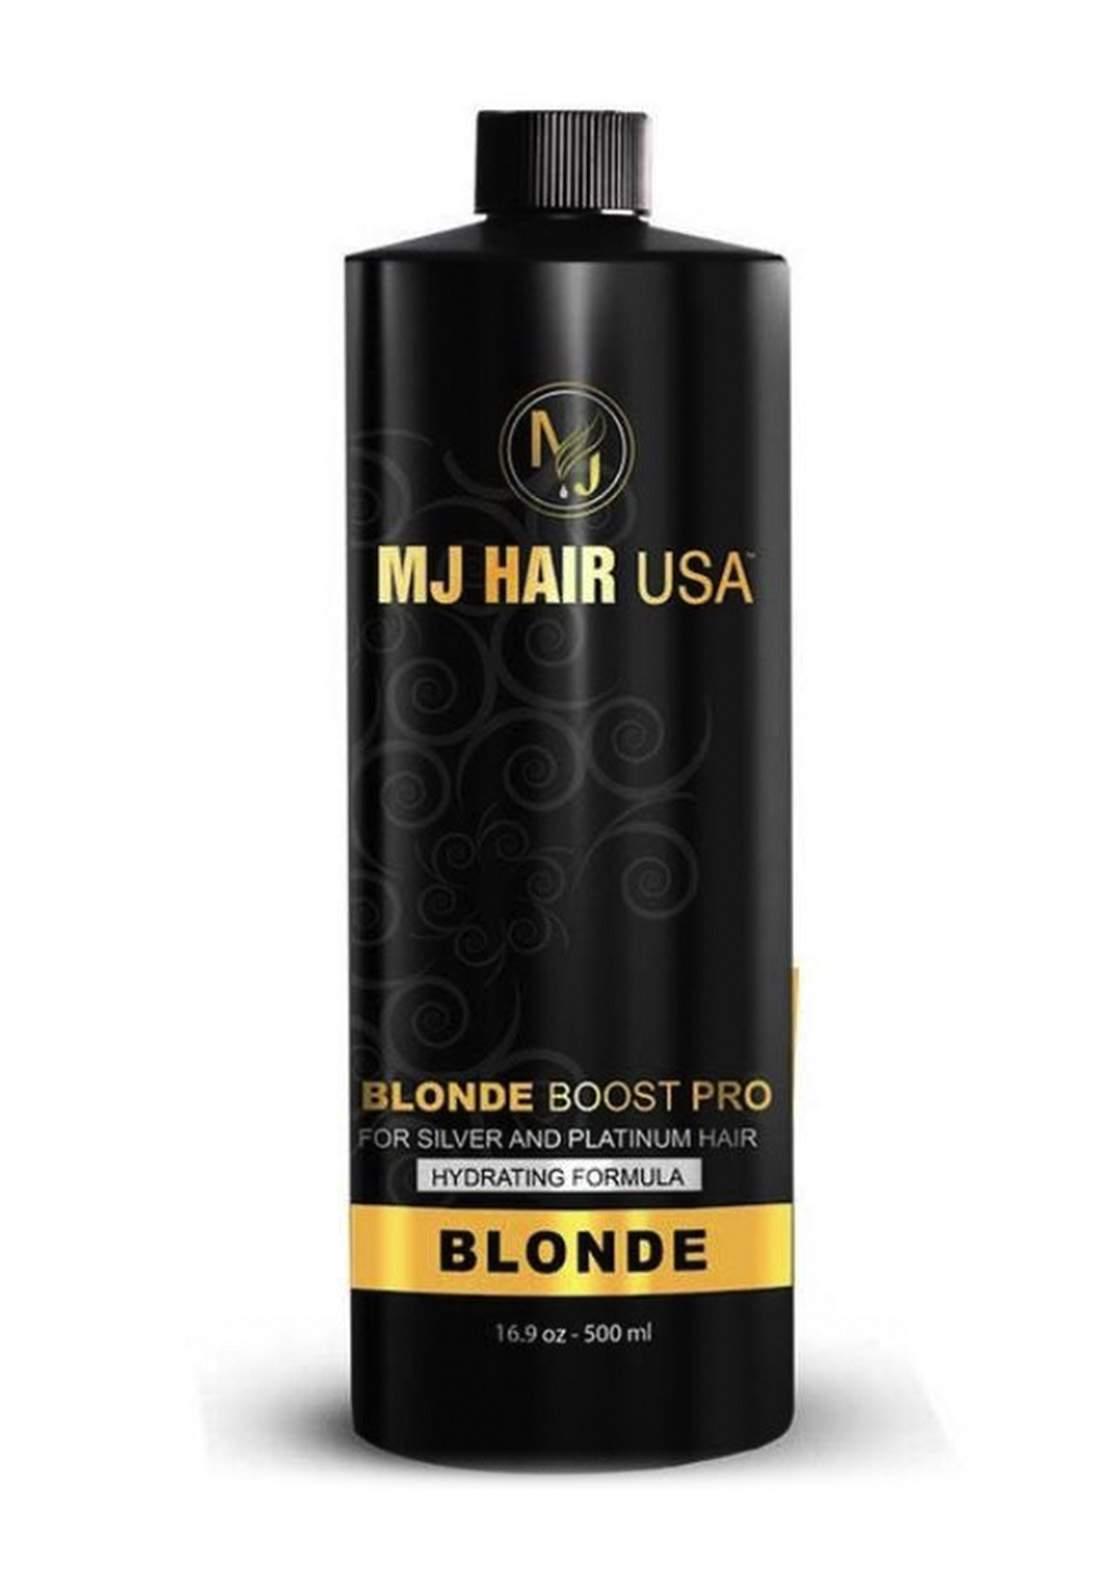 Mj Hair Blonde Boost Pro 500ml بلوندر